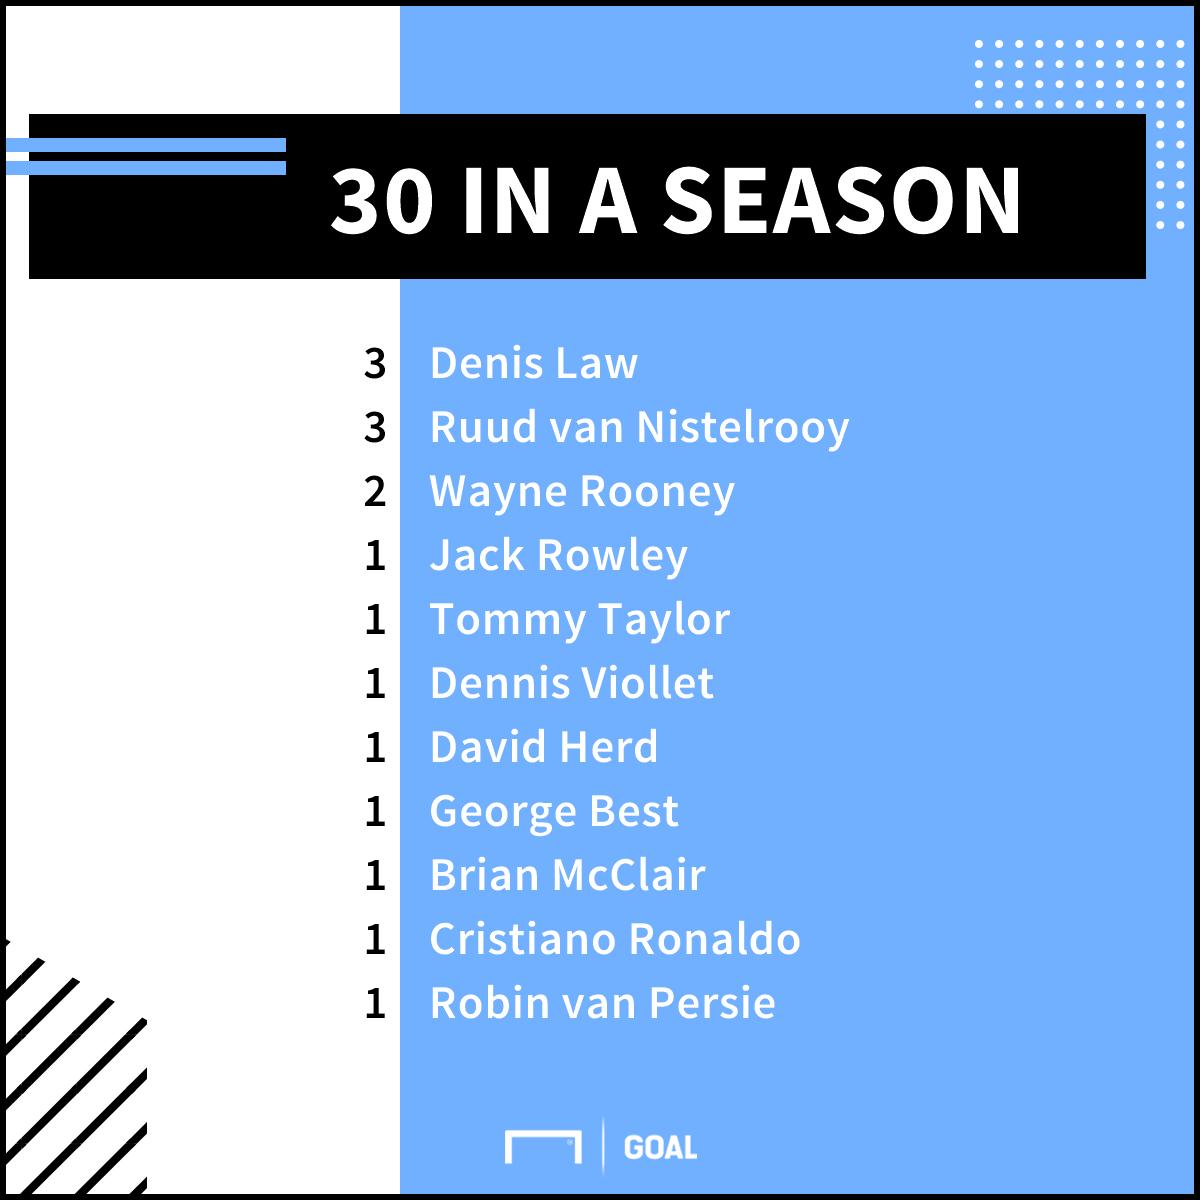 Man Utd 30-goal scorers